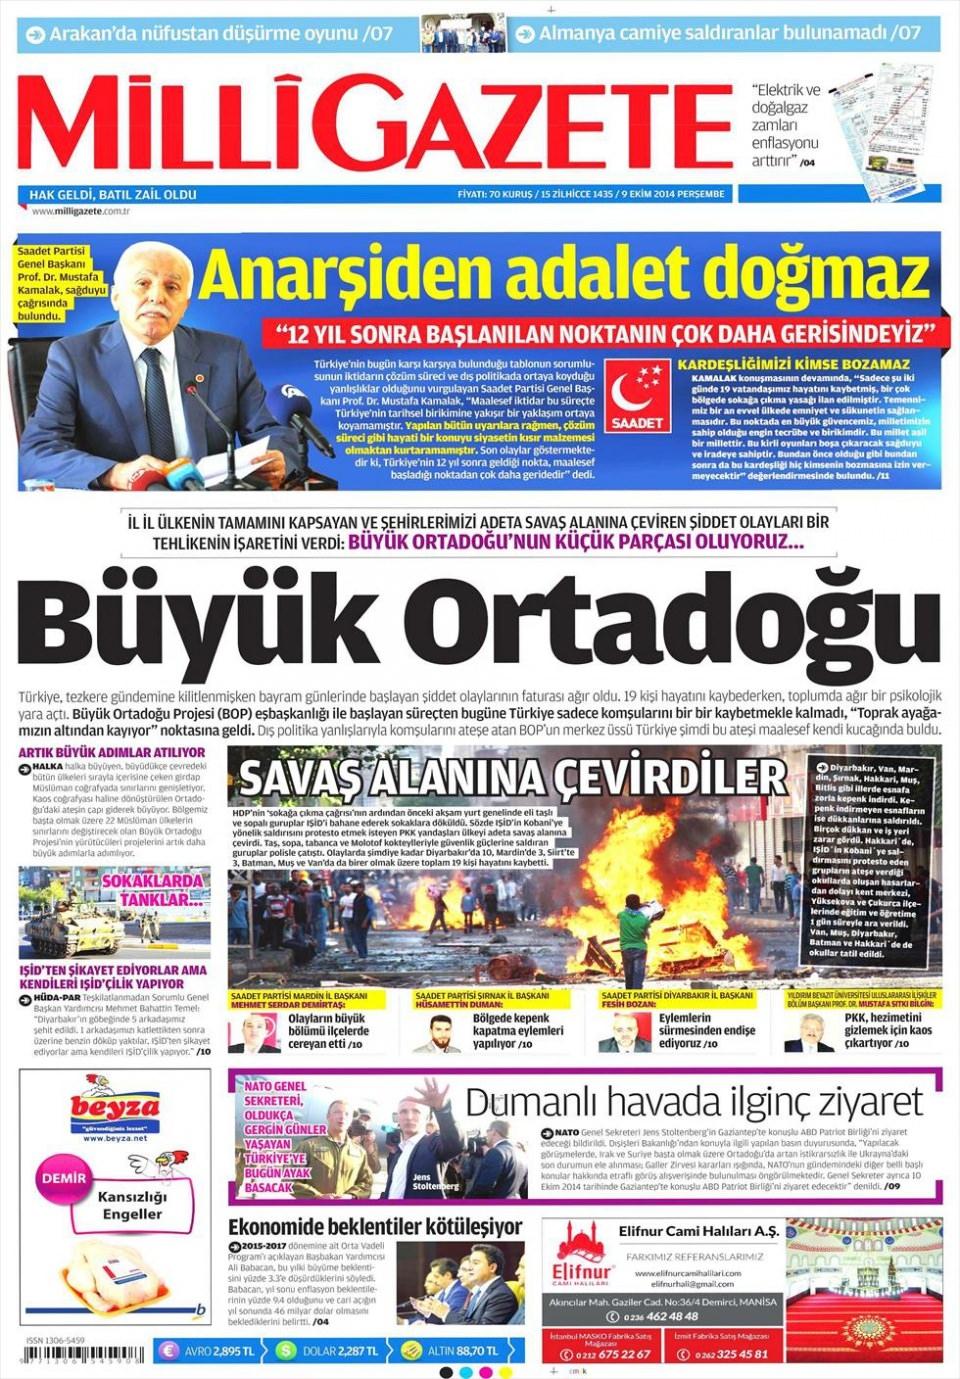 9 Ekim Gazete Manşetleri 11